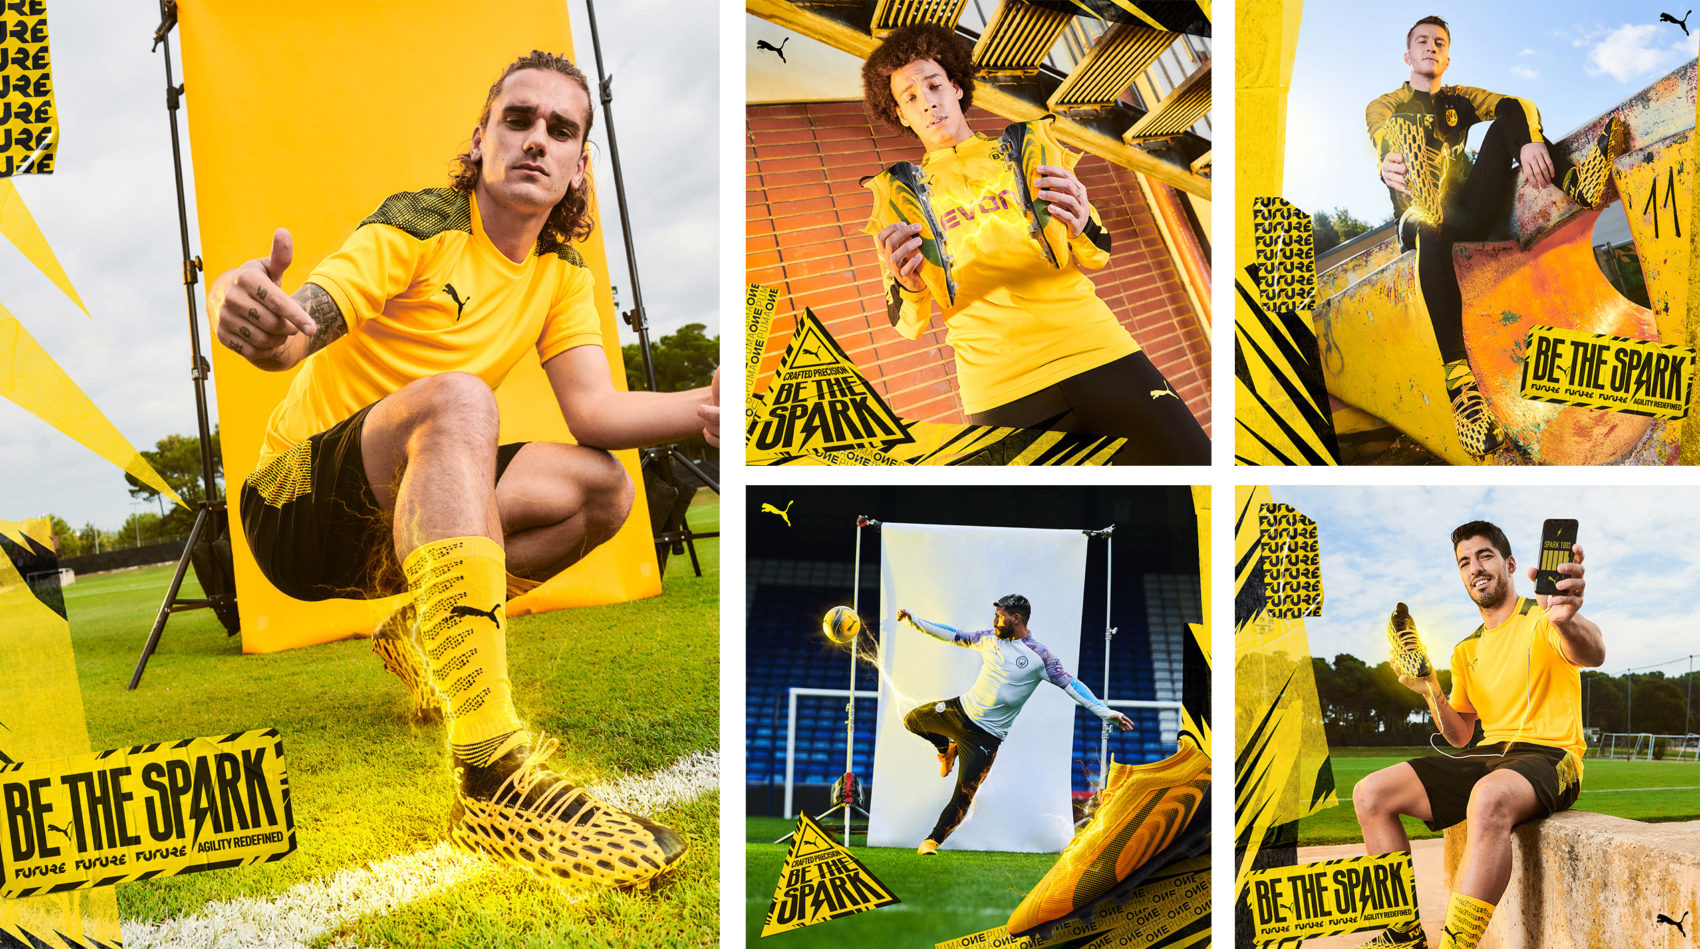 Visuels_Media_Projet_Be_the_Spark_Puma_Football_Campagne_de_marque_globale_Lafourmi